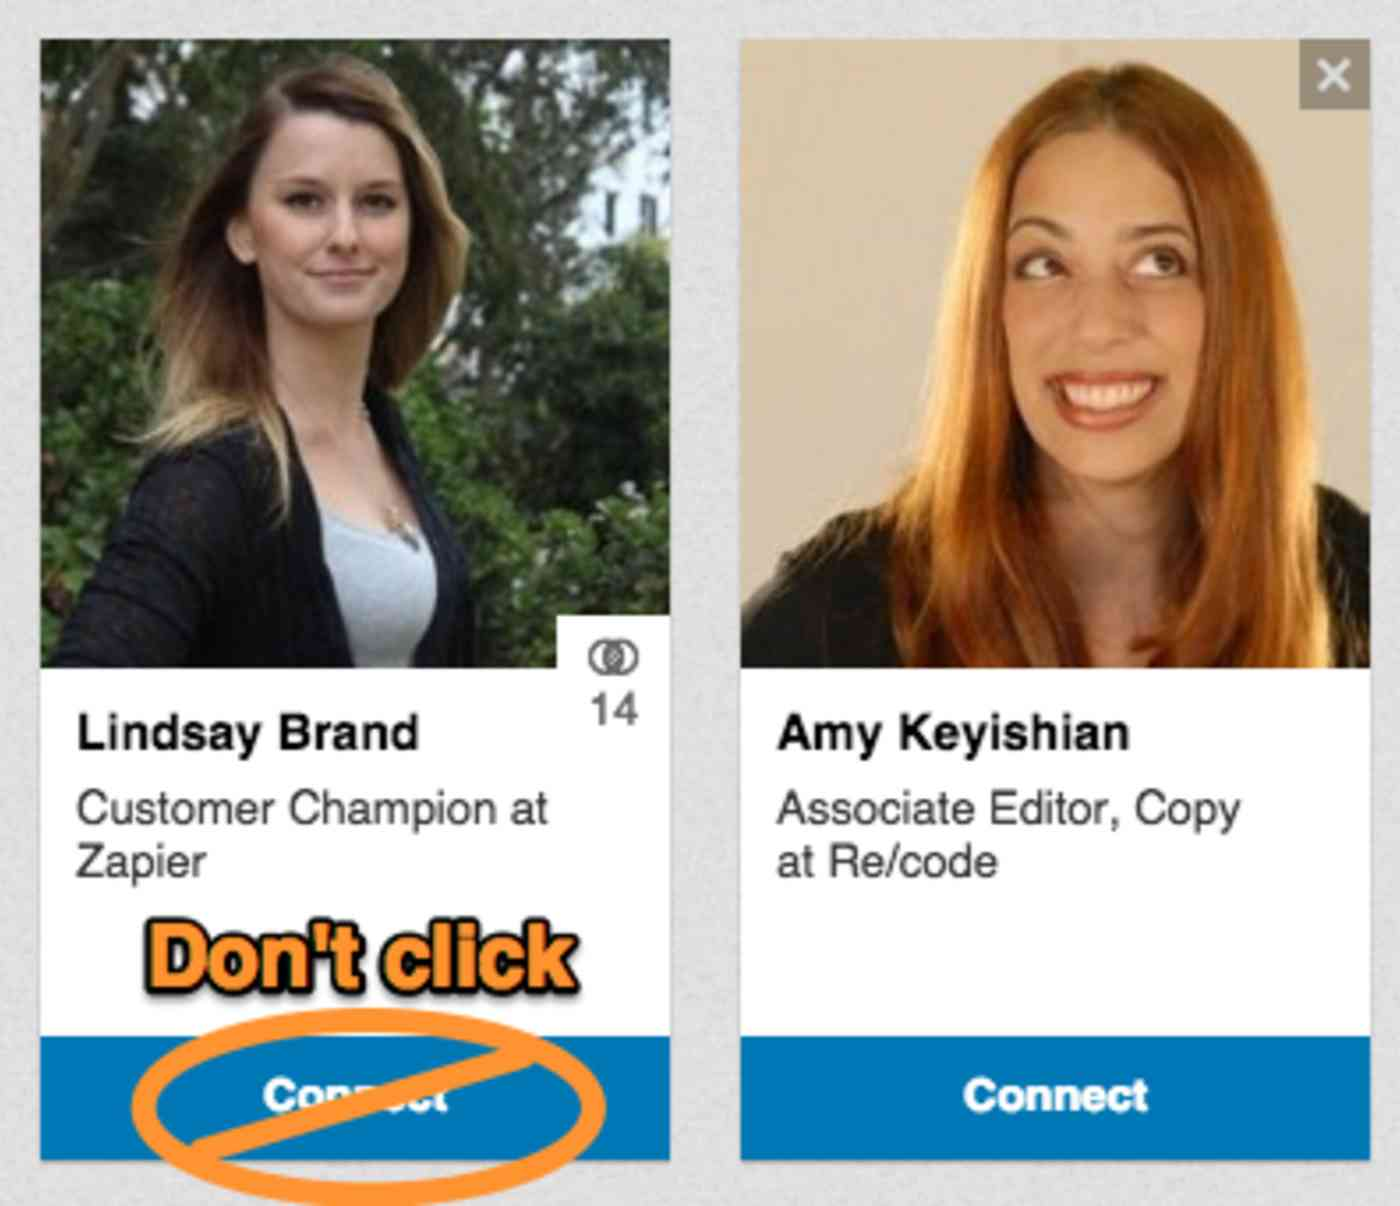 LinkedIn not personalized invite